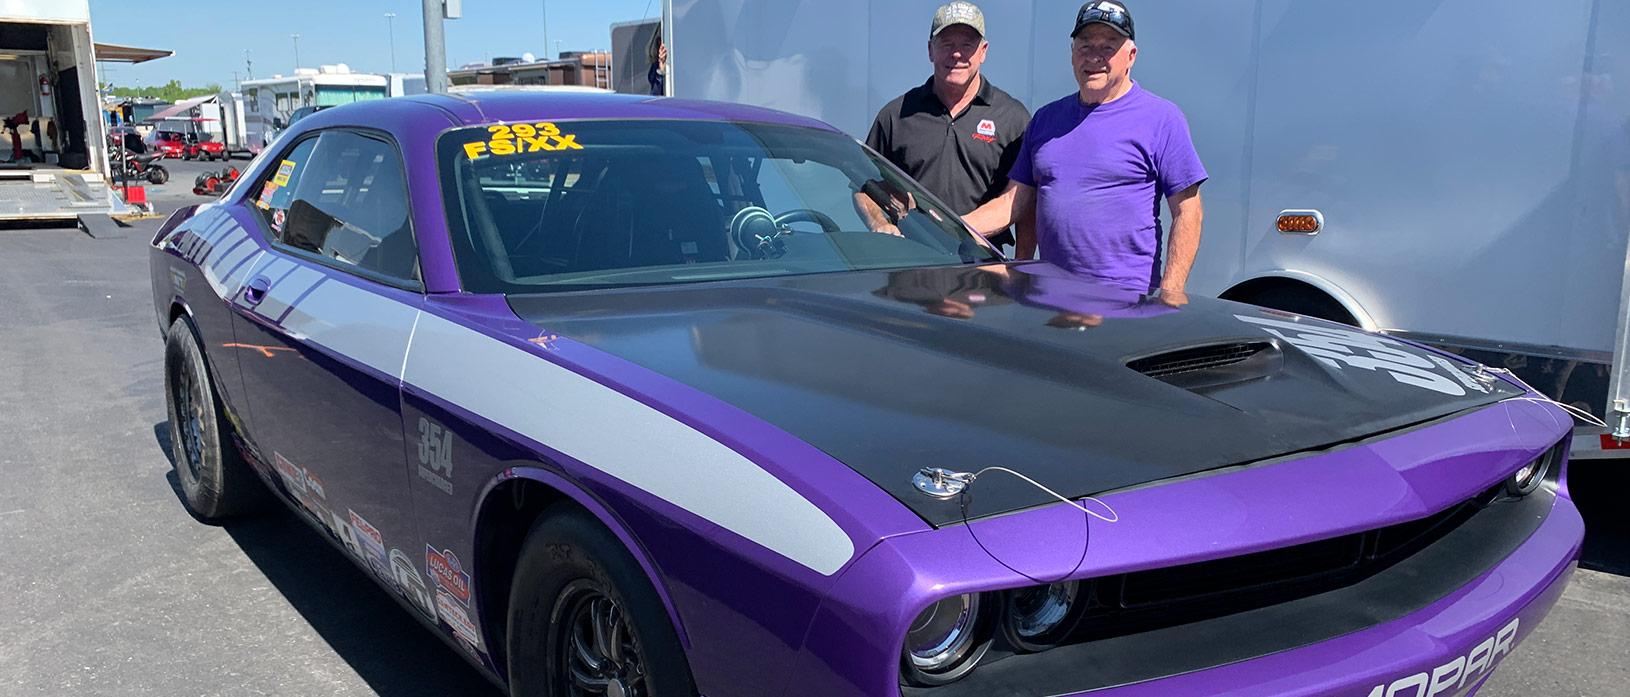 Two men posing next to purple challenger.